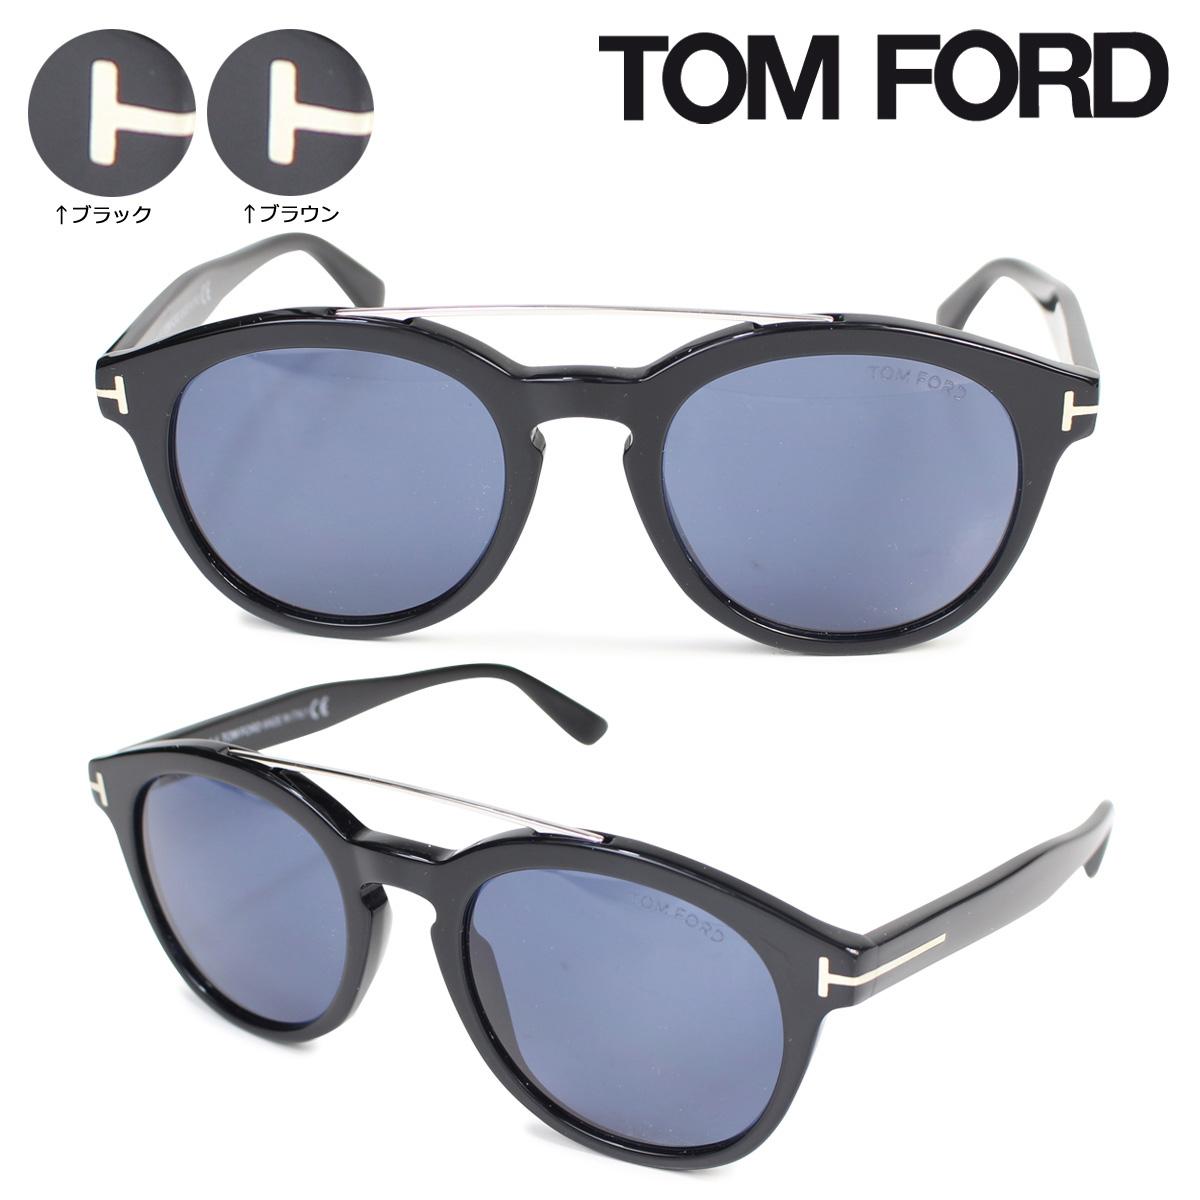 dde0c91bafe Sugar Online Shop  Tom Ford TOM FORD sunglasses glasses men gap Dis ...